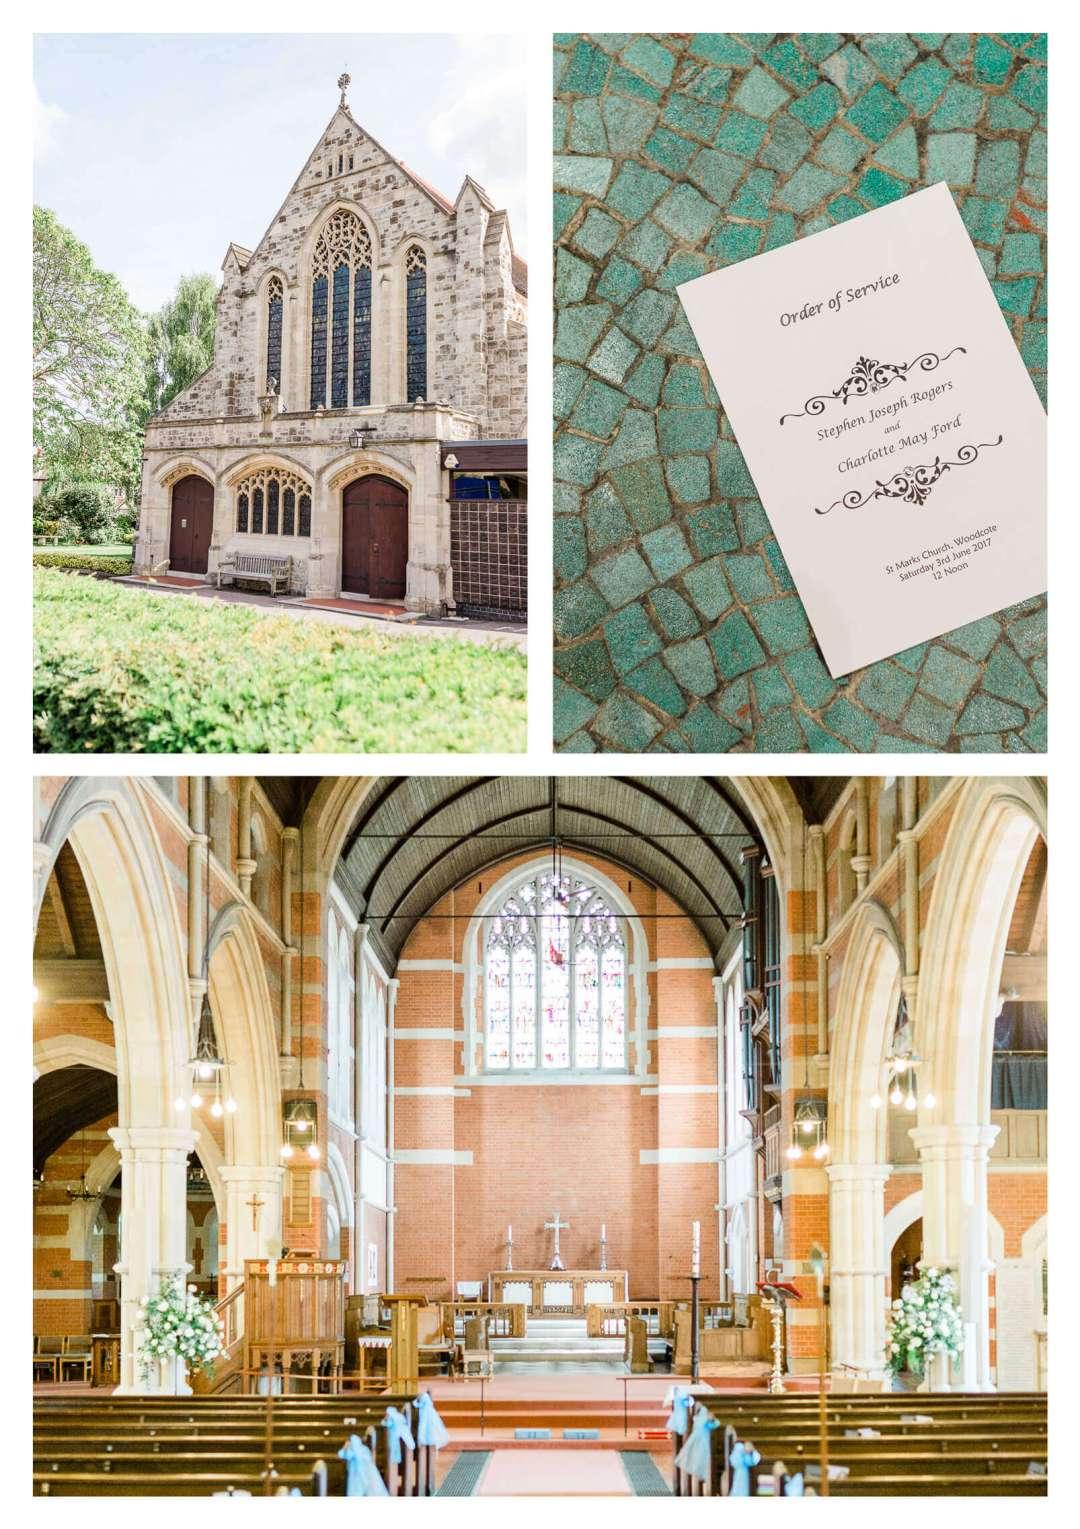 St Marks Church wedding ceremony in Croydon | London wedding photographer